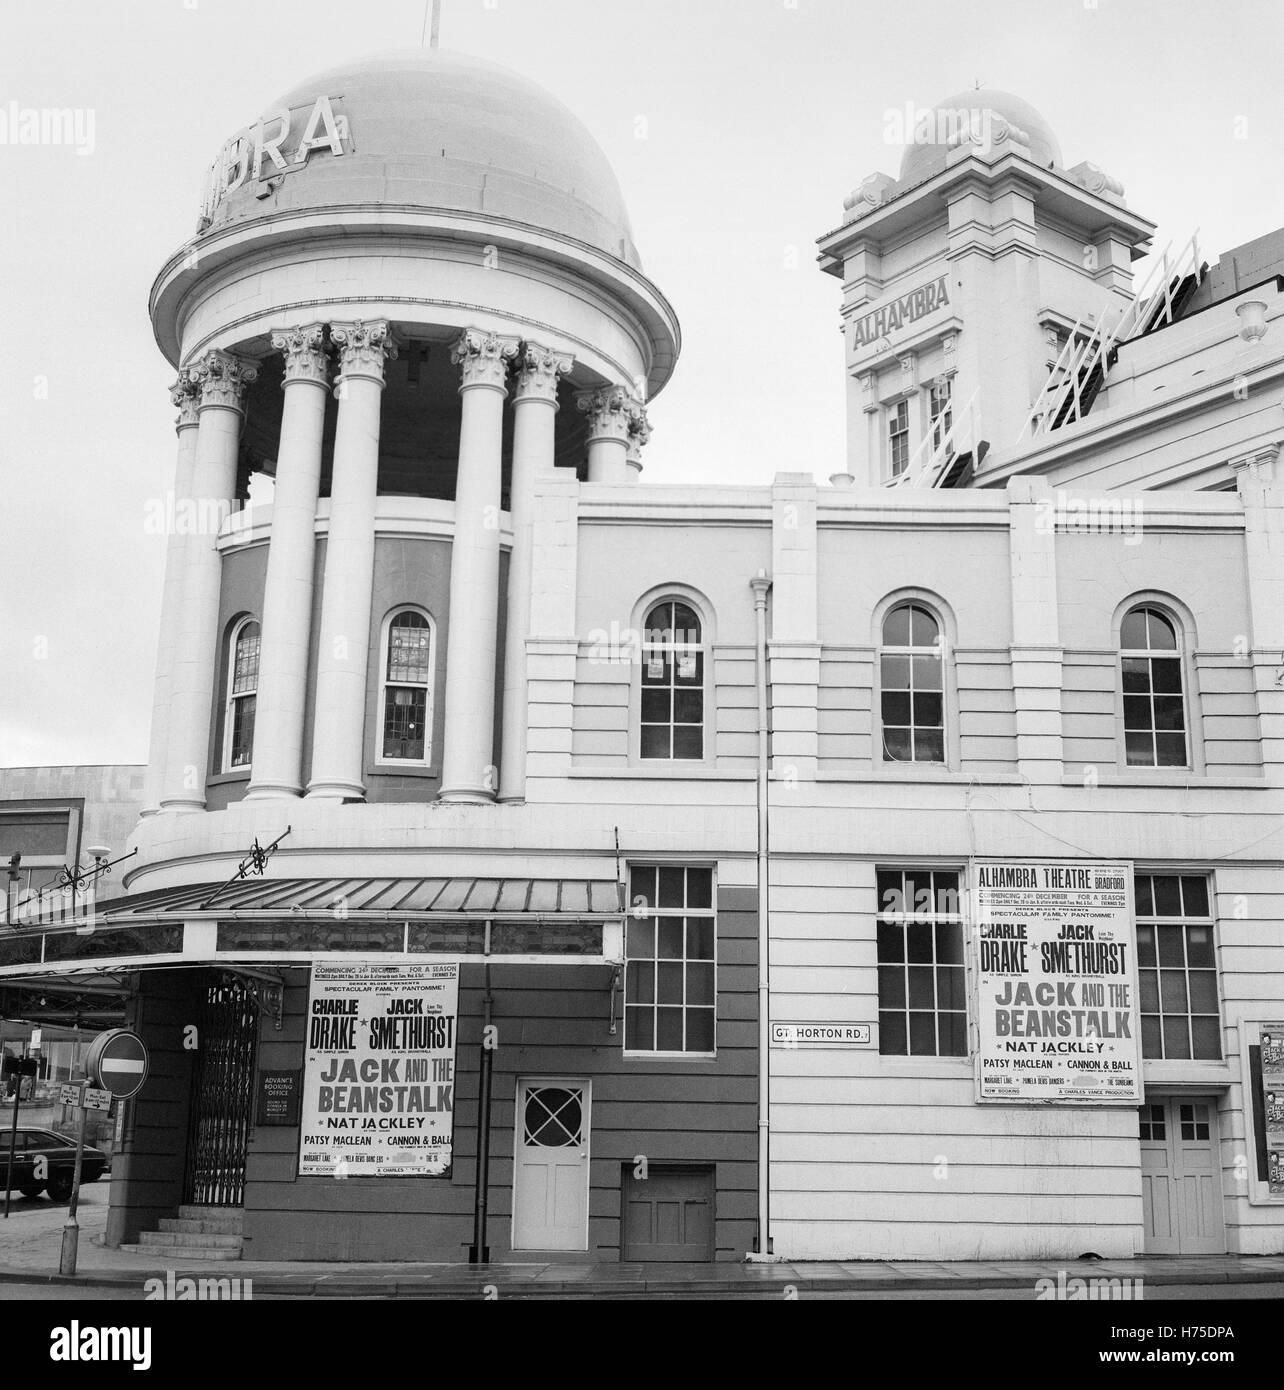 Alhambra Theatre Bradford West Yorkshire 1975 England UK - Stock Image